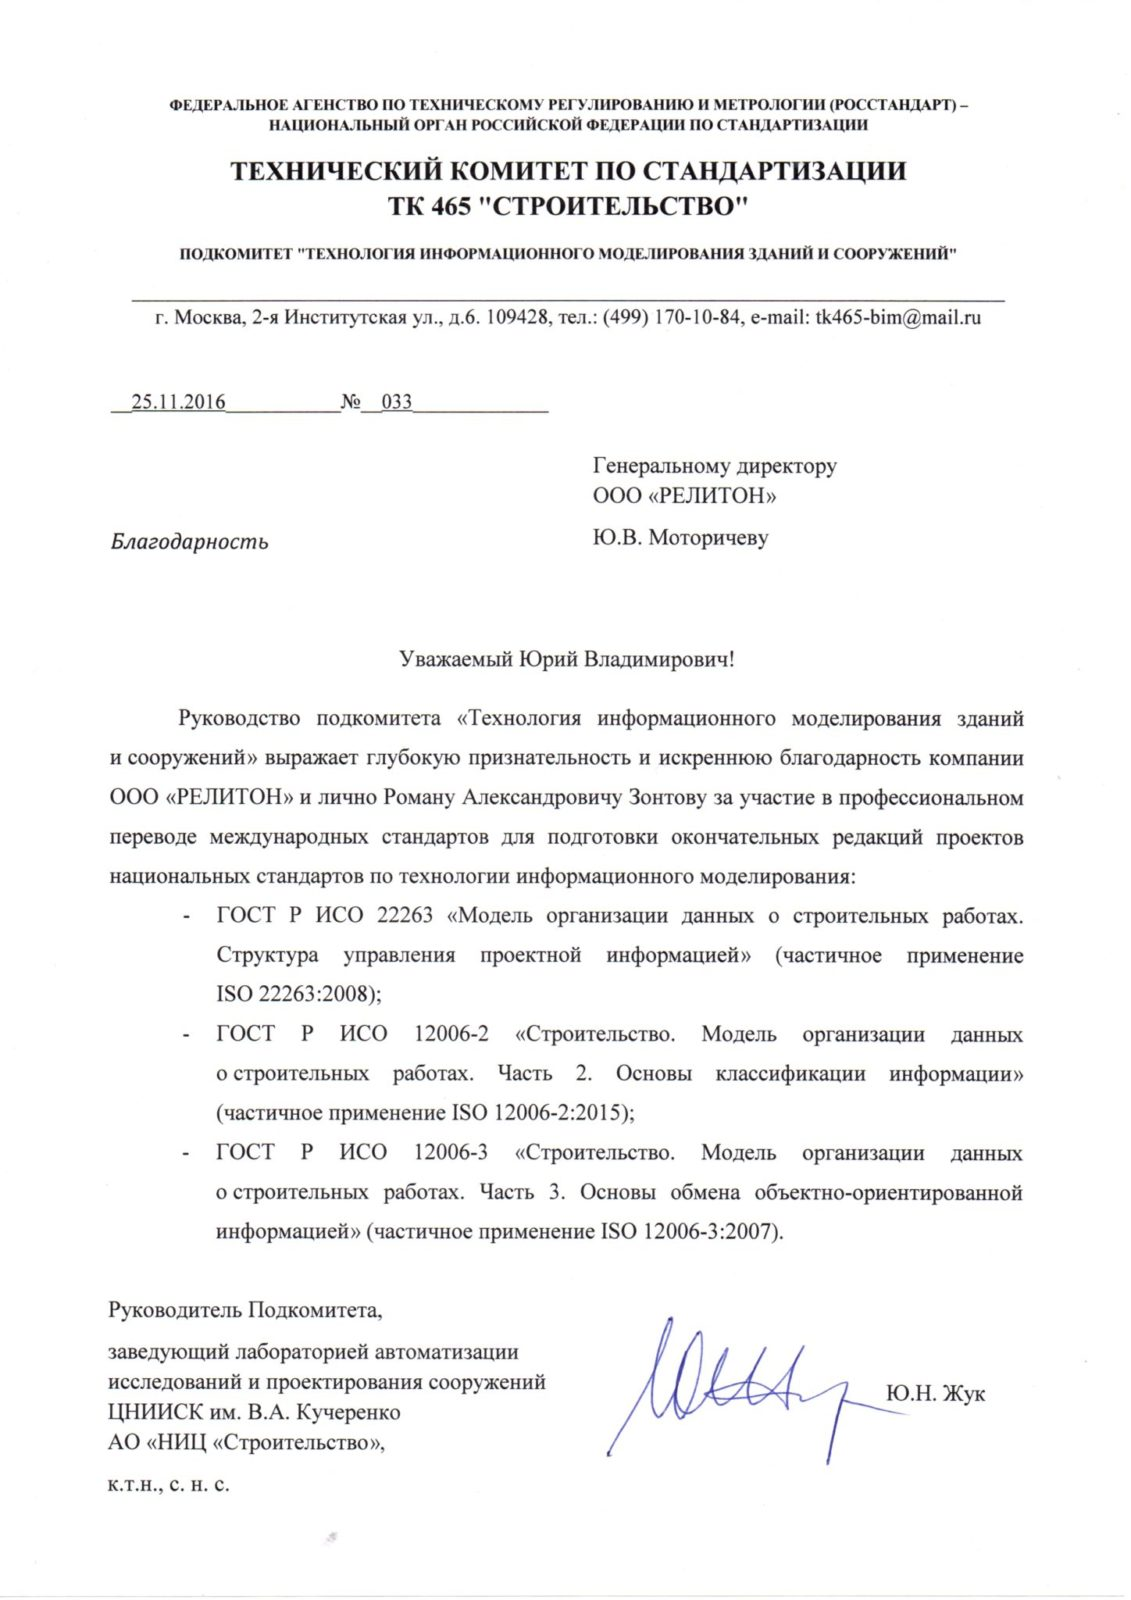 Otzyv-o-sotrudnichestve-s-kompaniej-reliton-ot-Tehnicheskogo-komiteta-po-standartizatsii-TK-465-Stroitelstvo.jpg